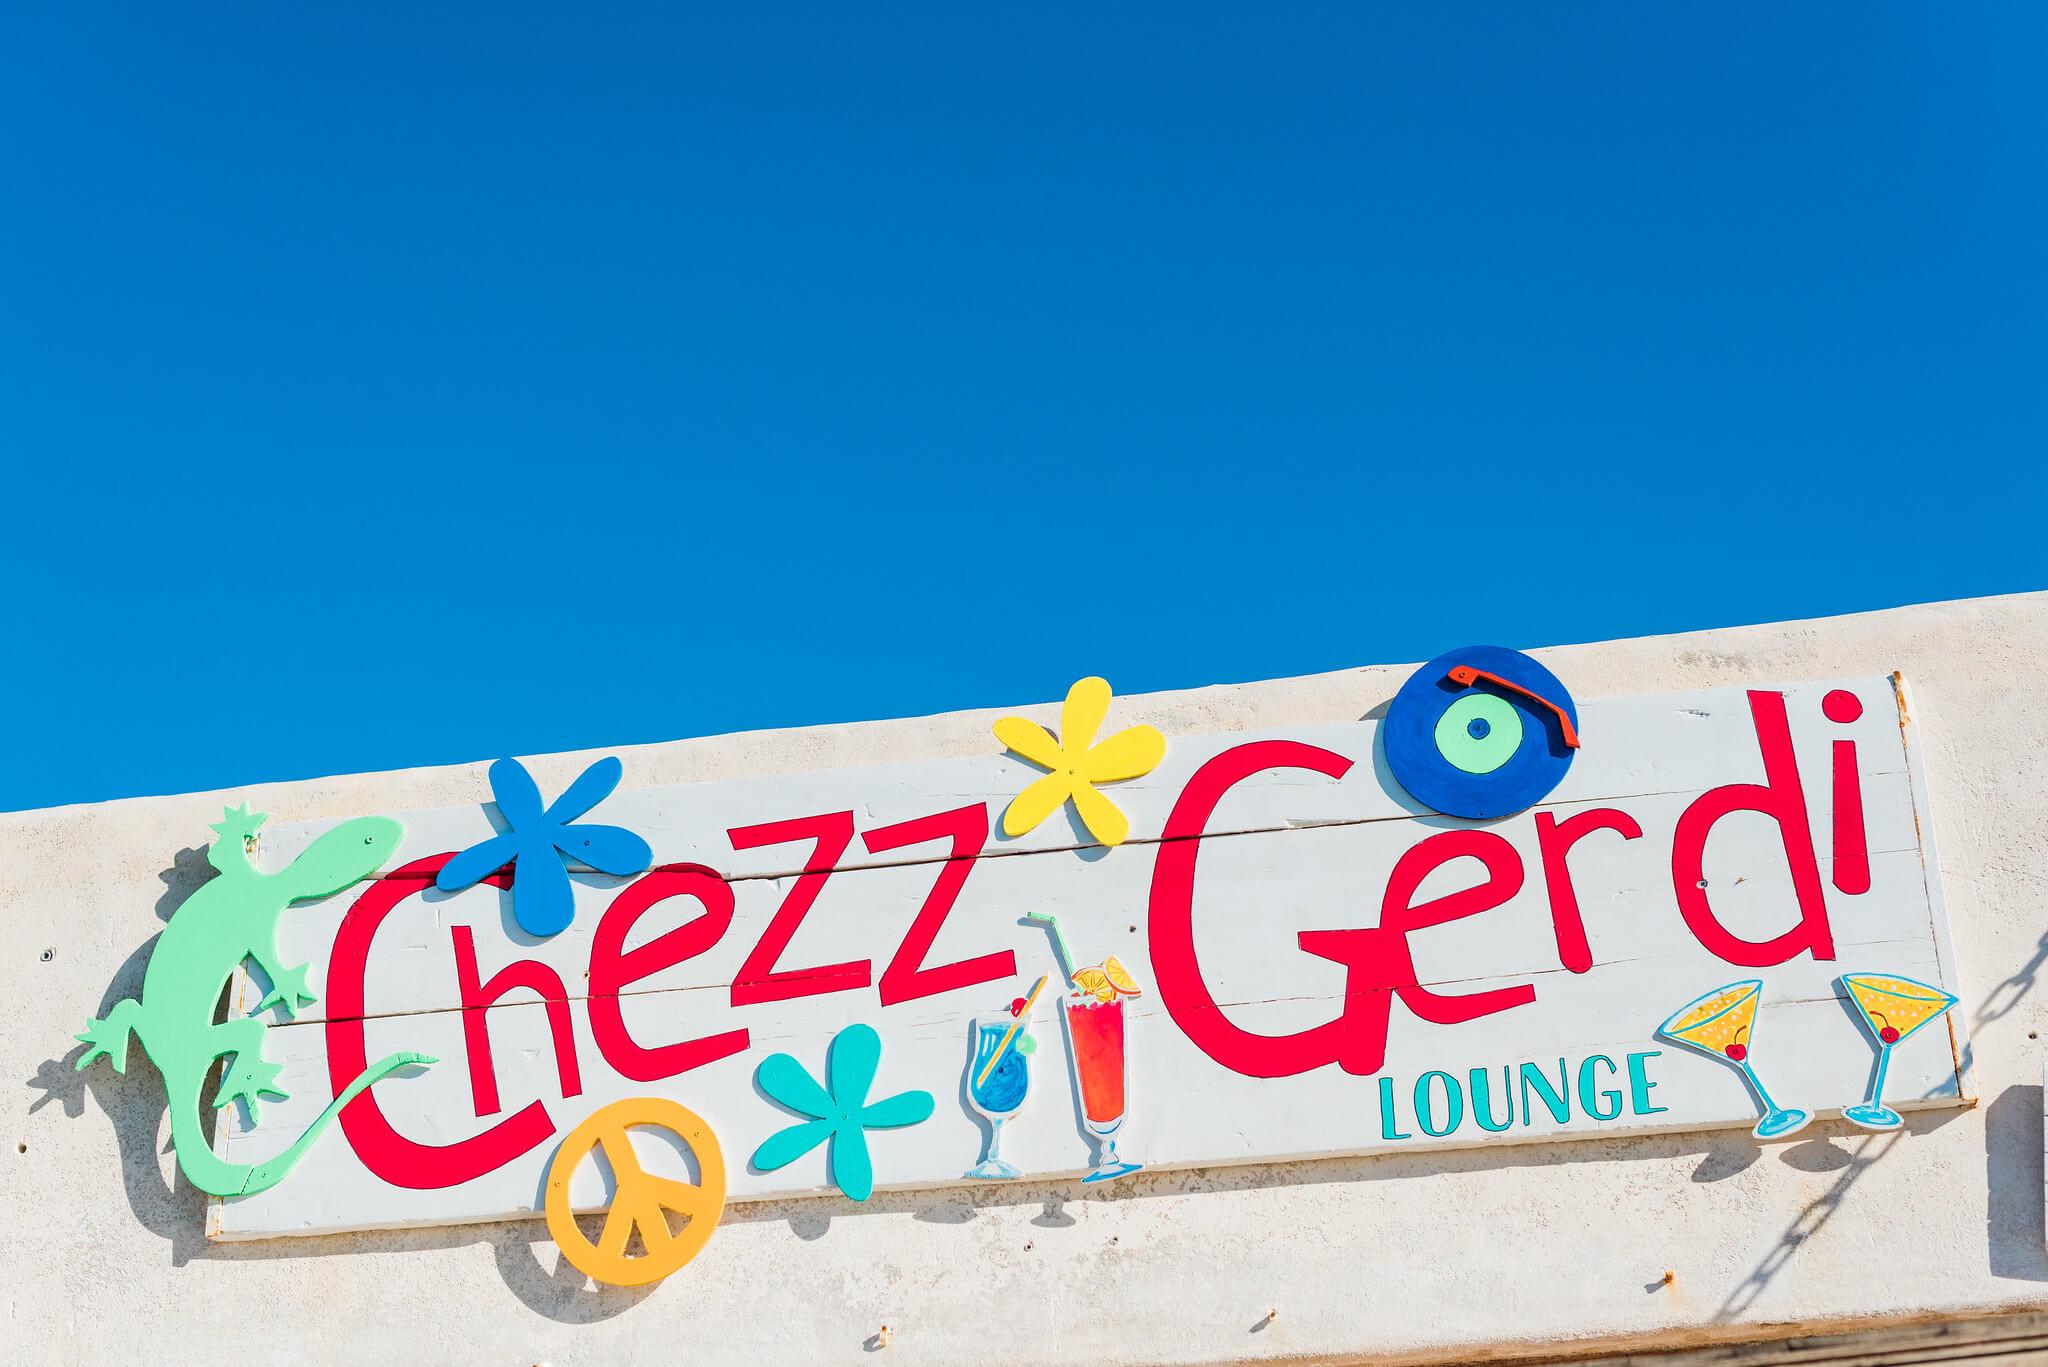 https://www.white-ibiza.com/wp-content/uploads/2020/03/formentera-beach-restaurants-chezz-gerdi-2020-06.jpg